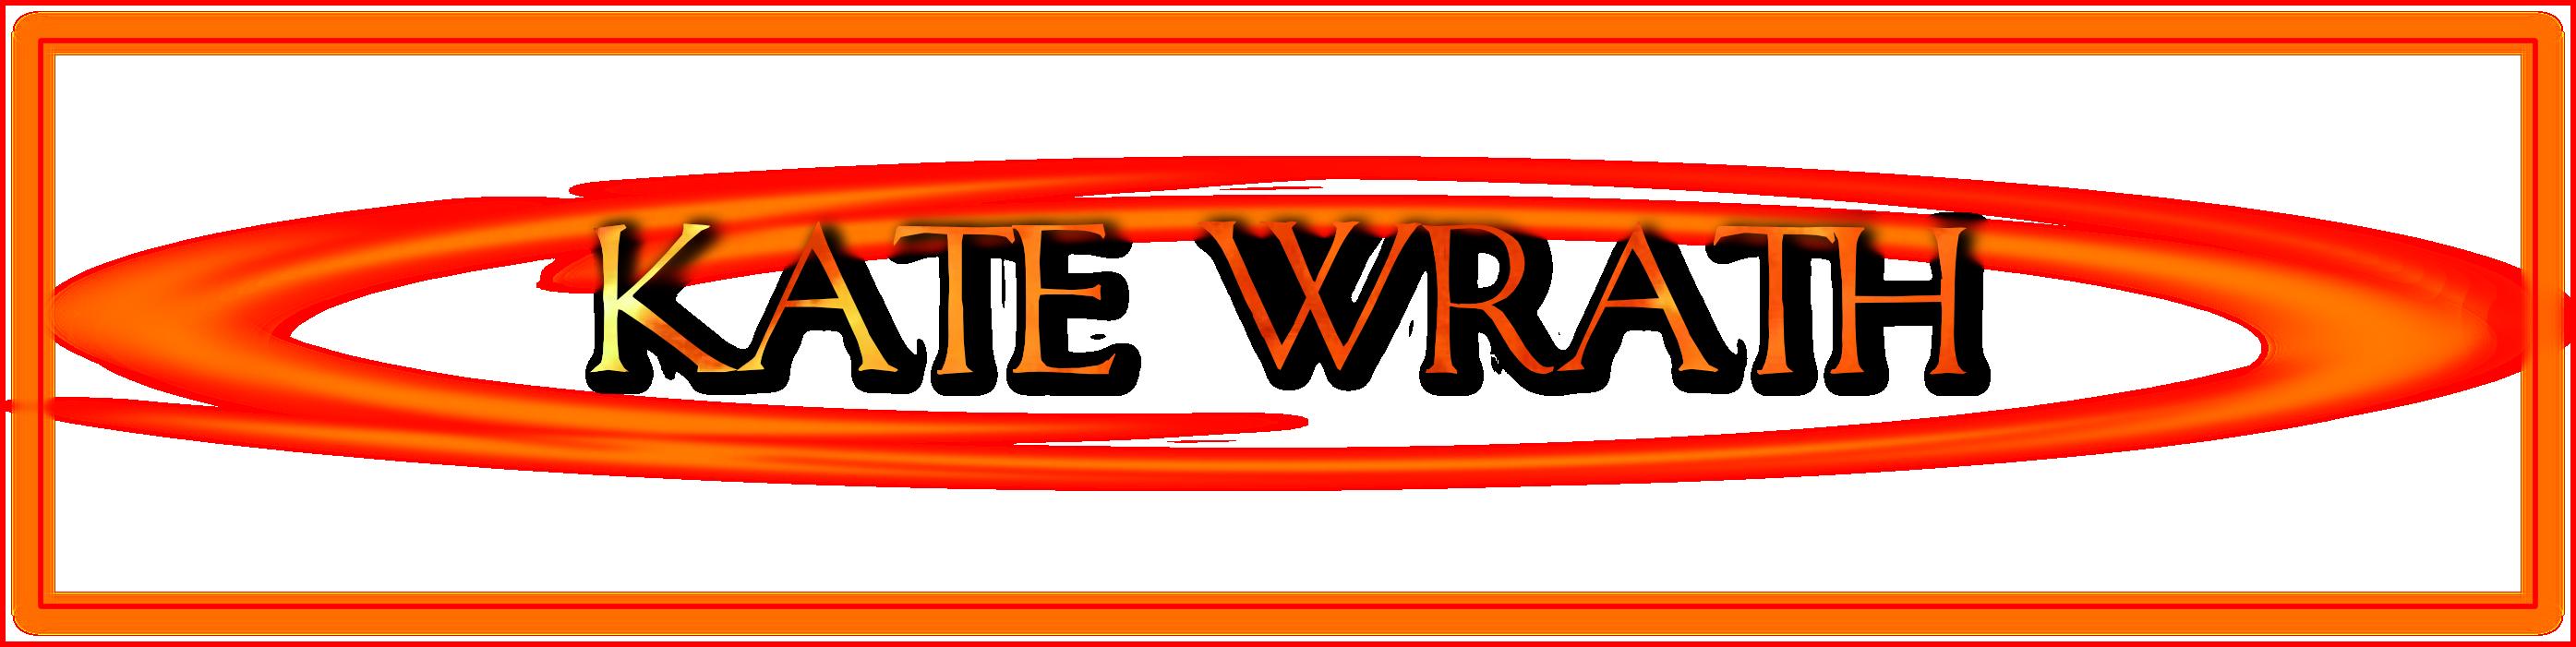 Kate Wrath